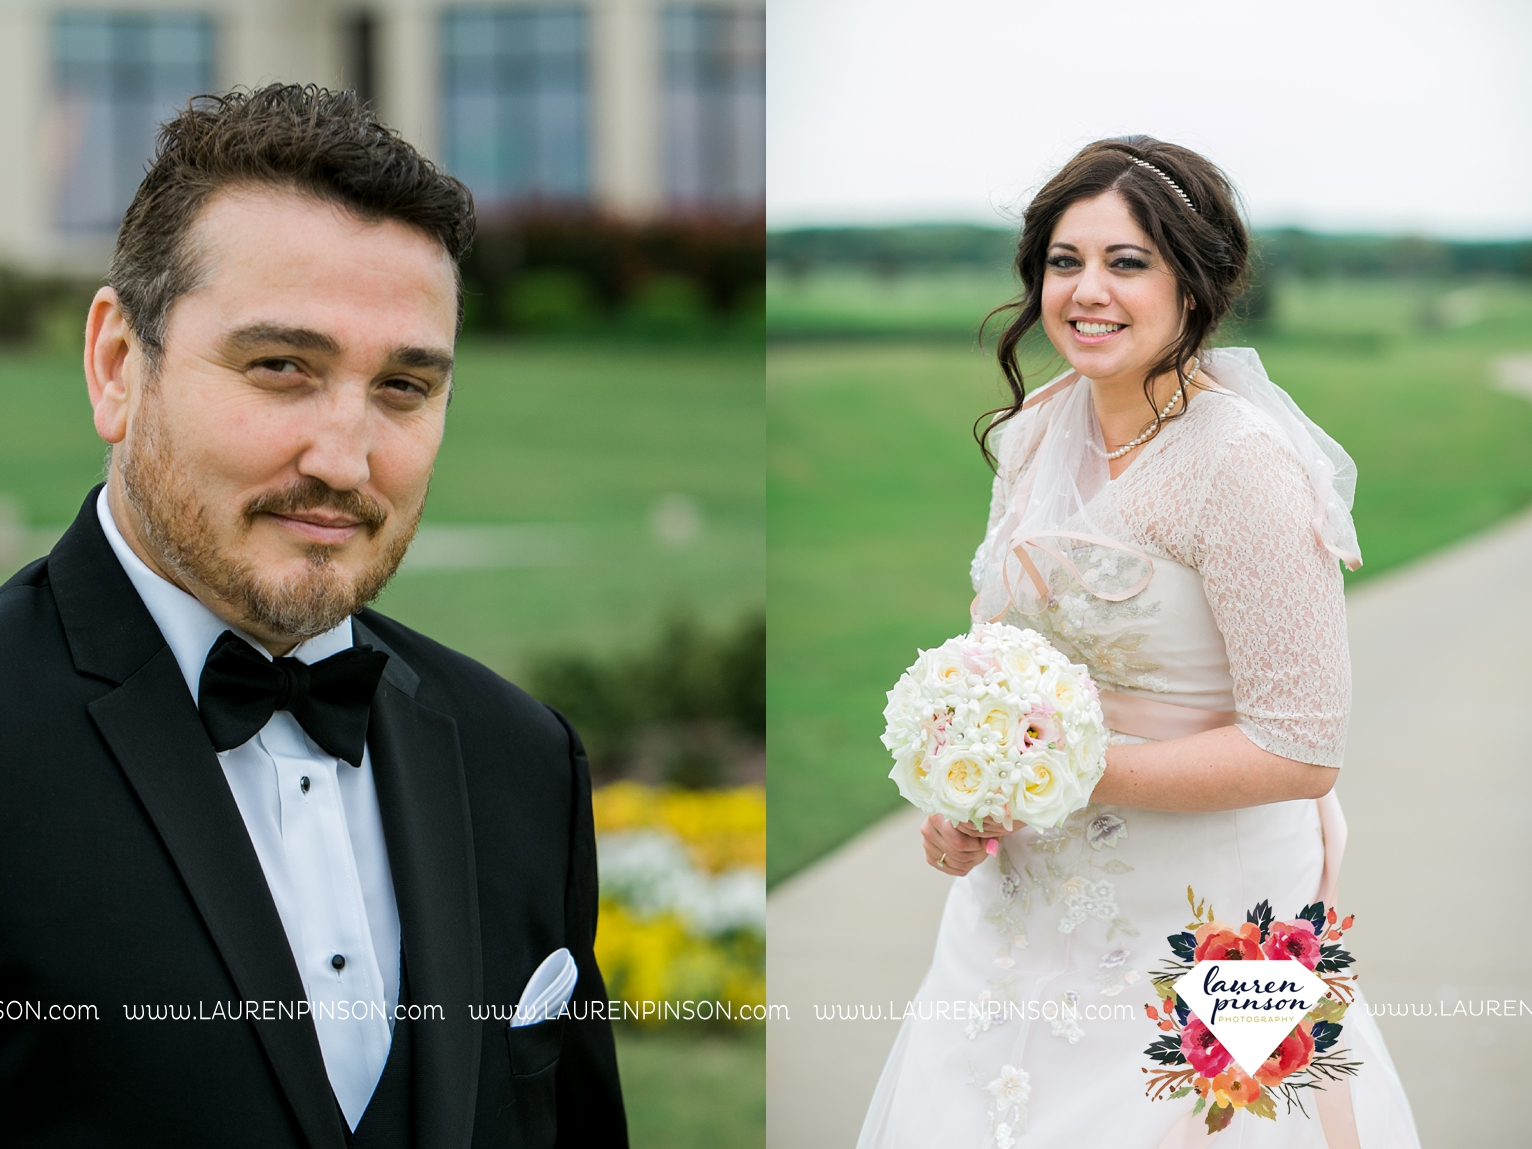 gainesville-texas-sherman-texas-thackerville-oklahoma-wedding-photographer-at-winstar-casino-golf-resort_2270.jpg